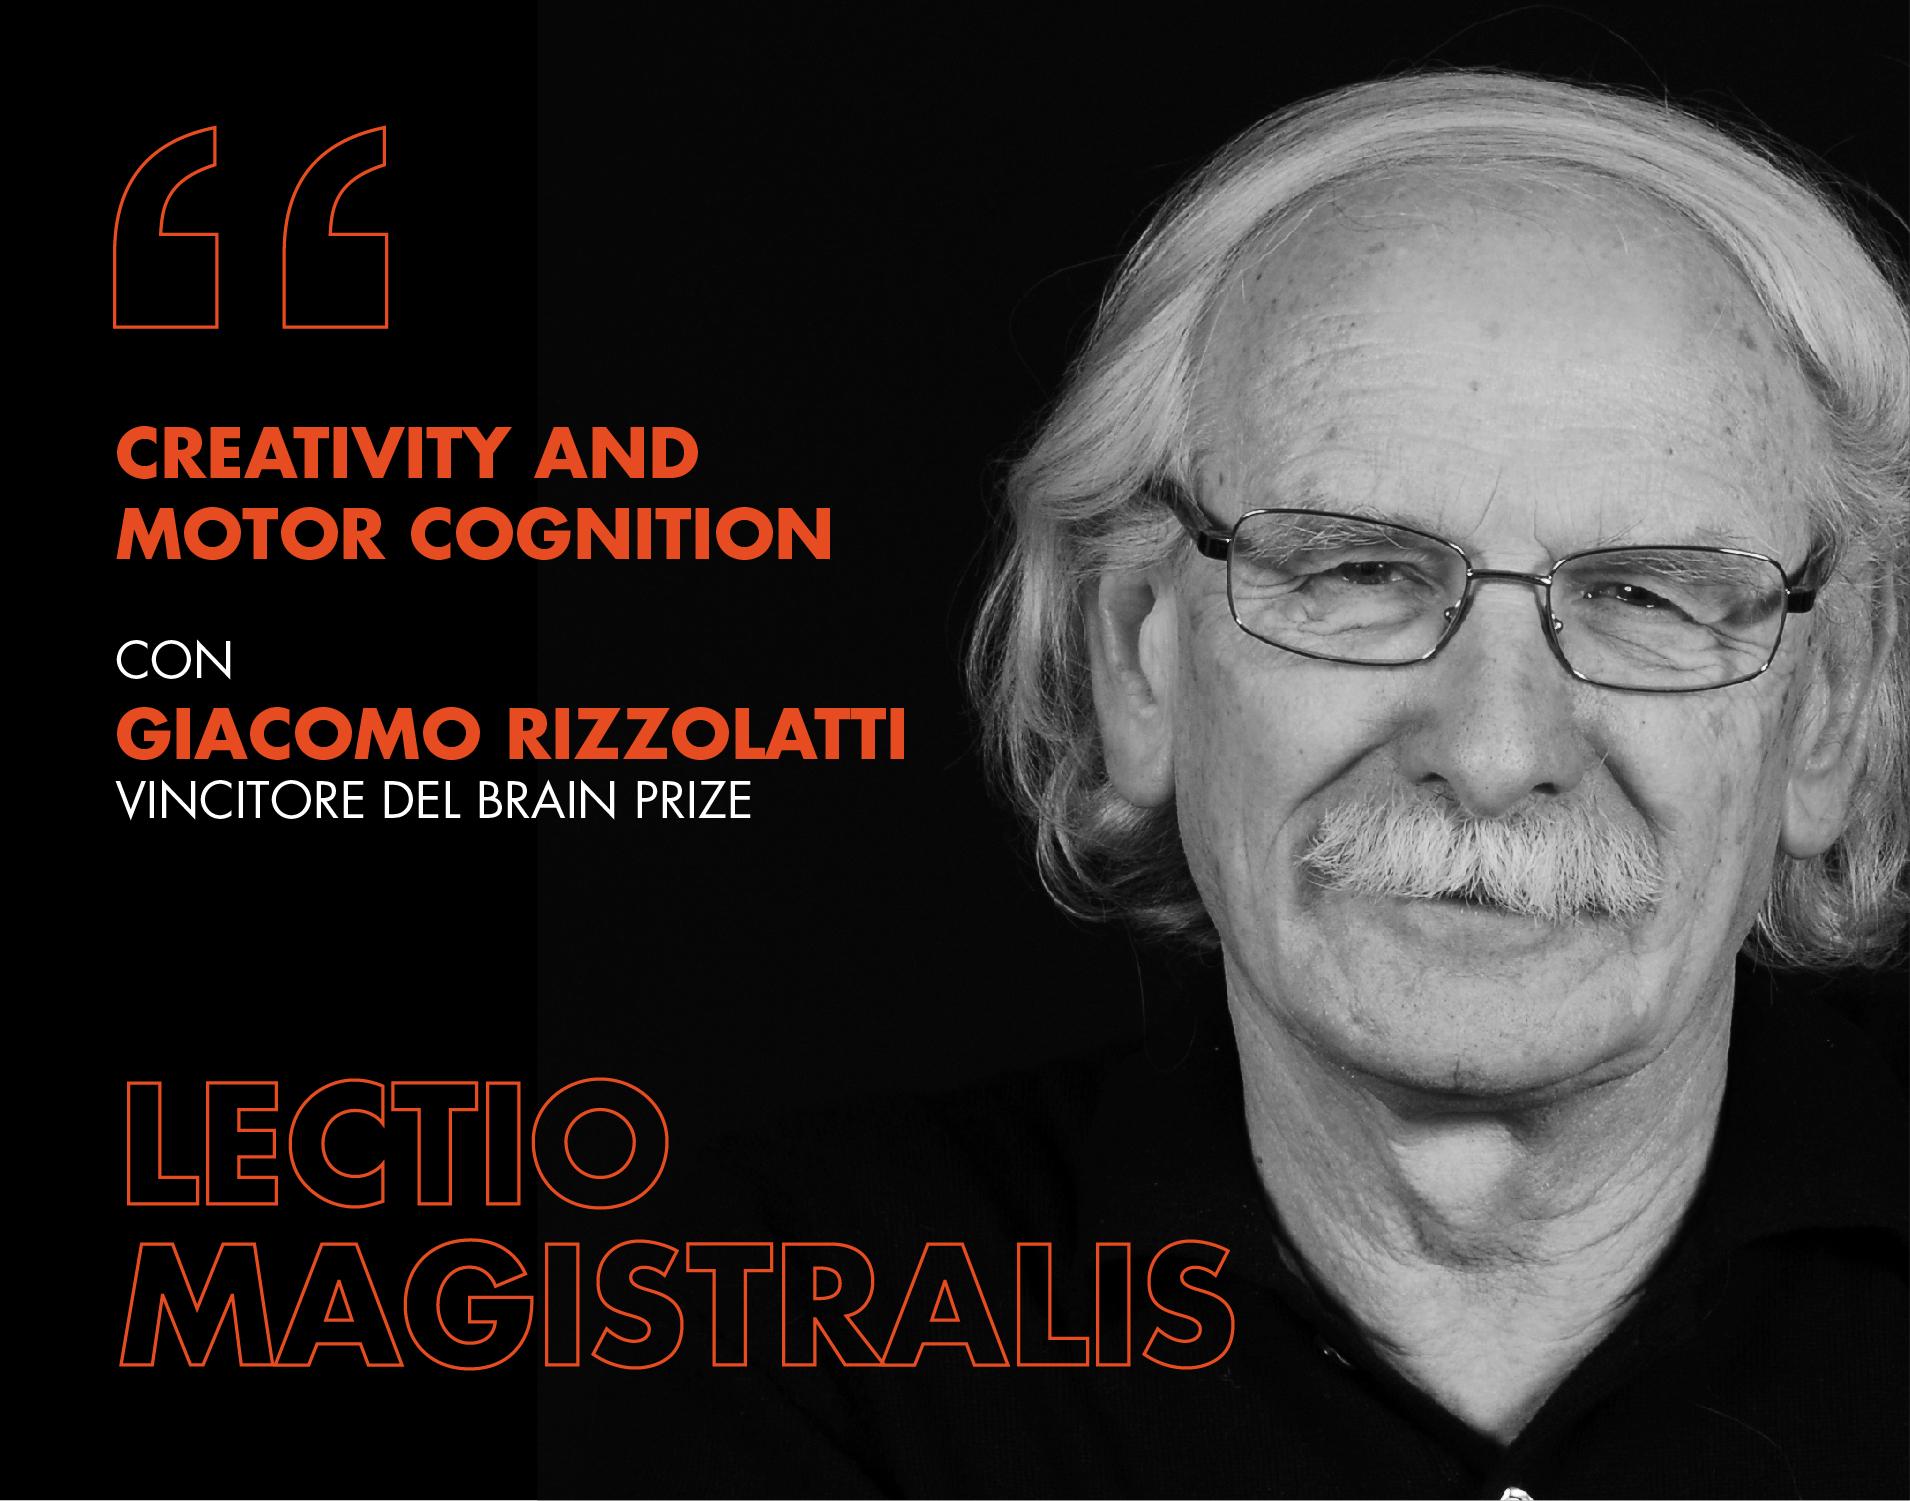 Creativity and Motor Cognition - Lectio Magistralis Rizzolati 1